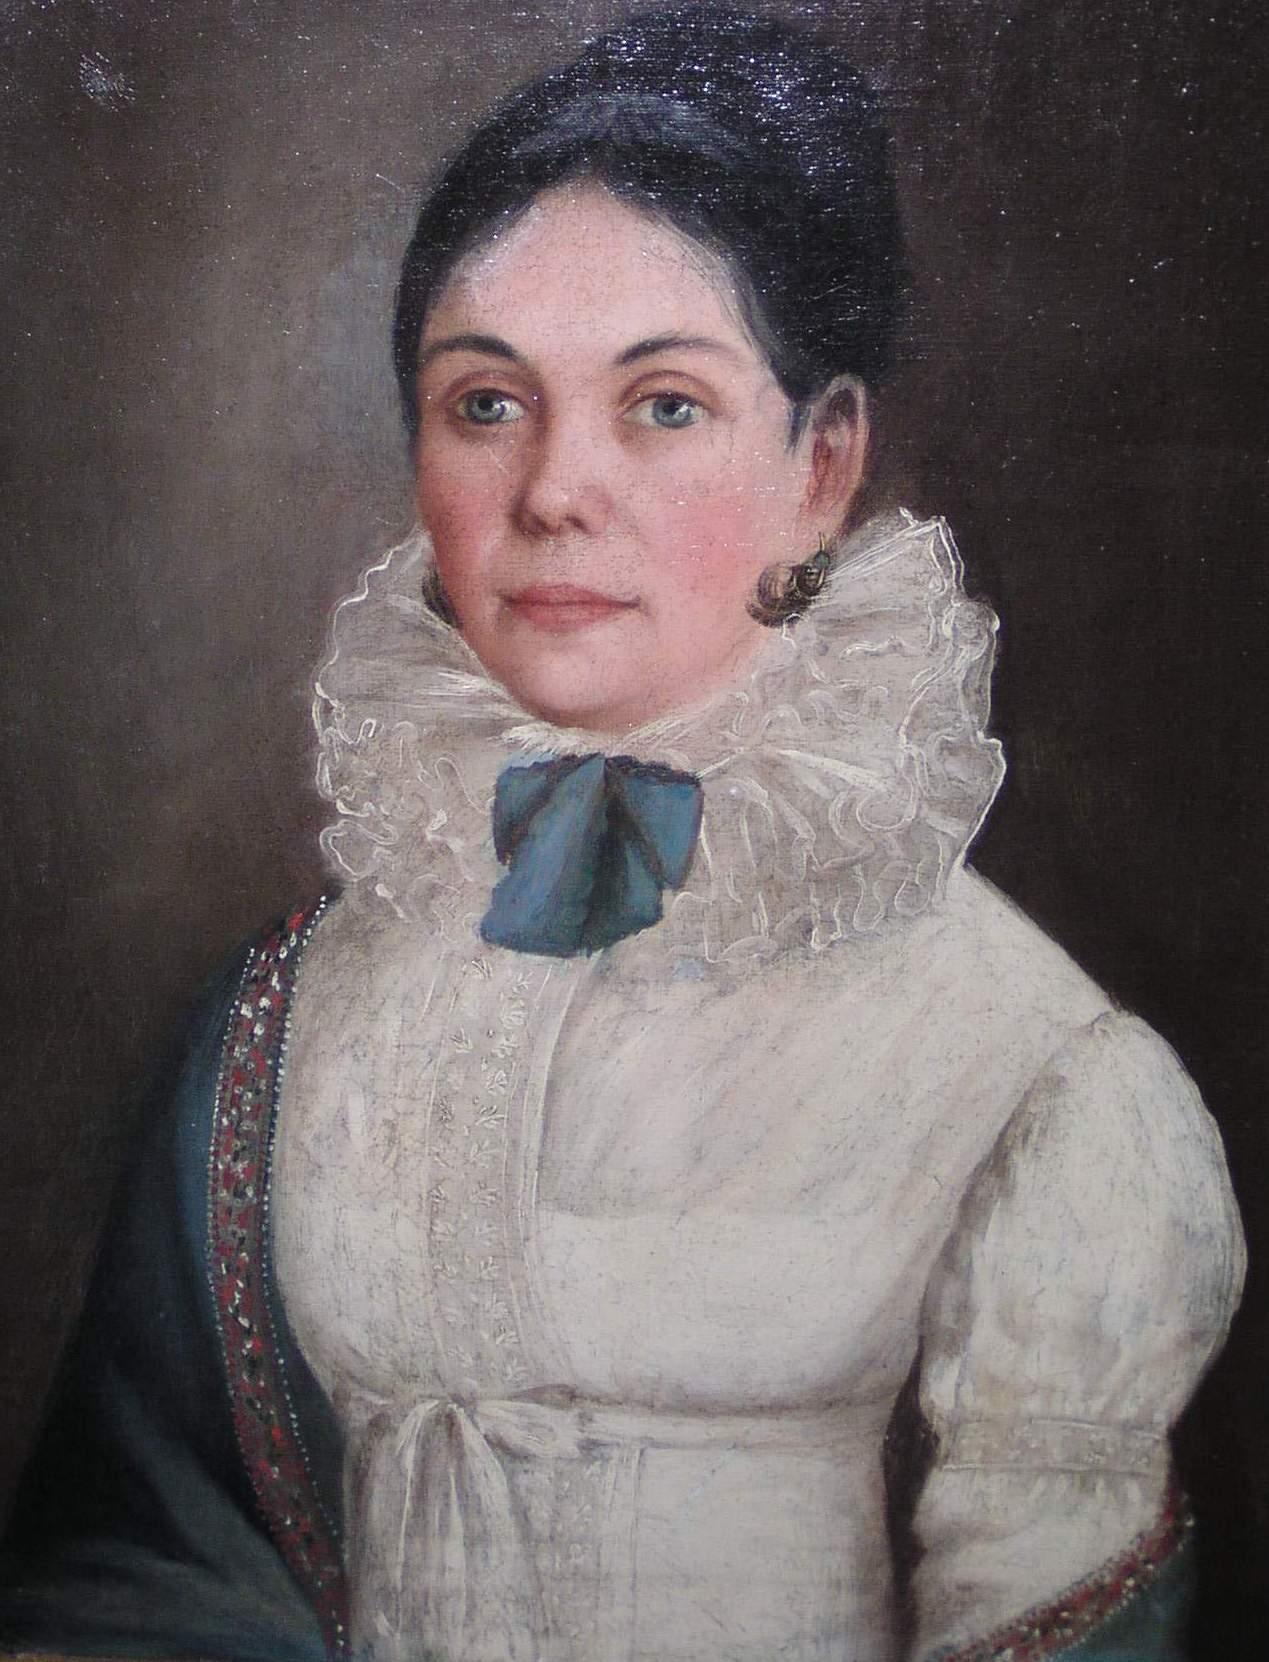 Александра Илларионовна Пушкина, урождённая Молчанова